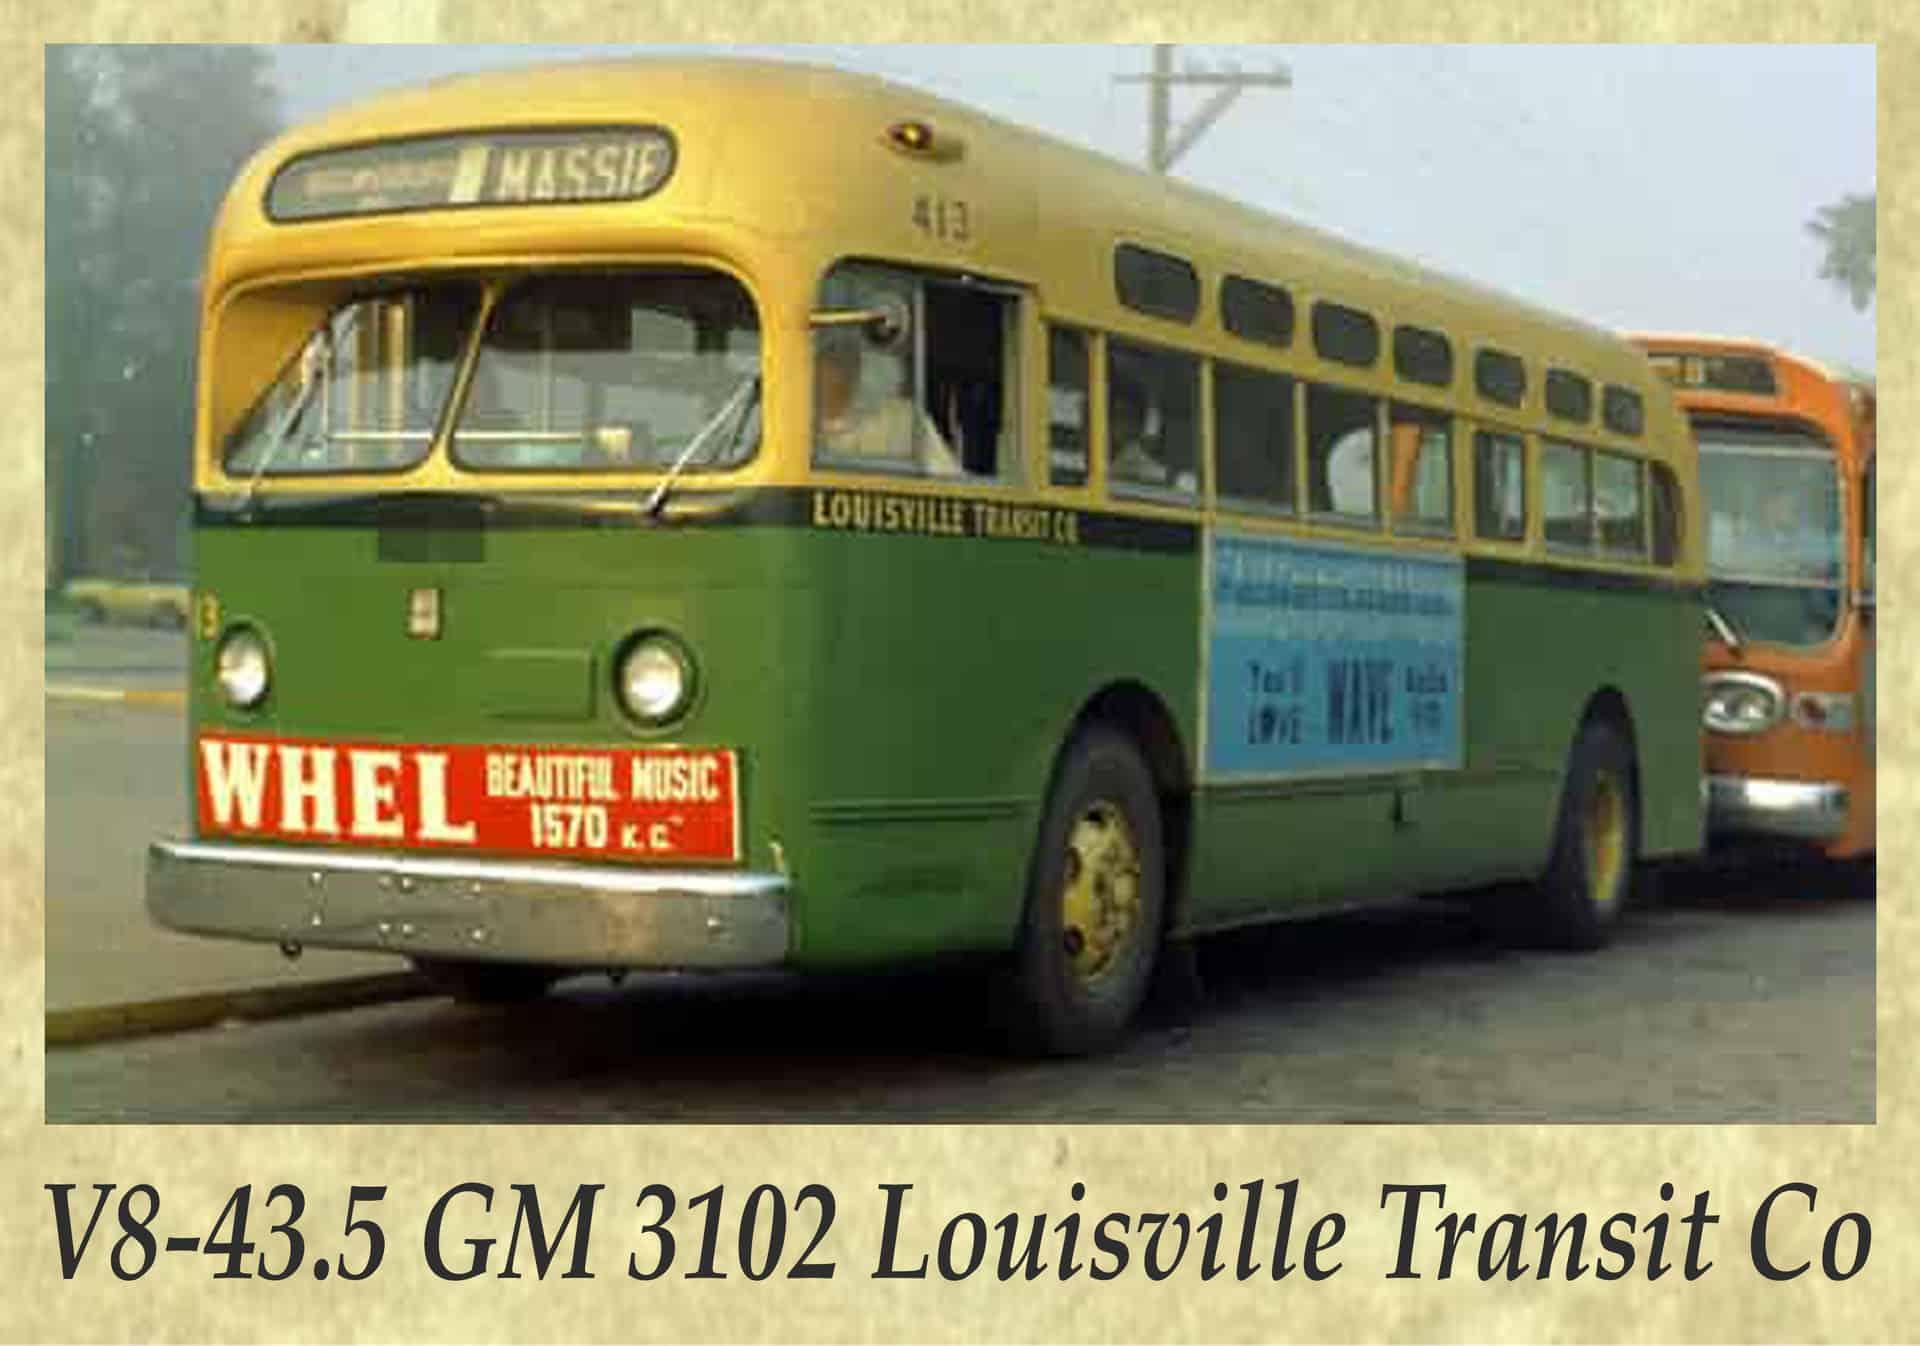 V8-43.5 GM 3102 Louisville Transit Co